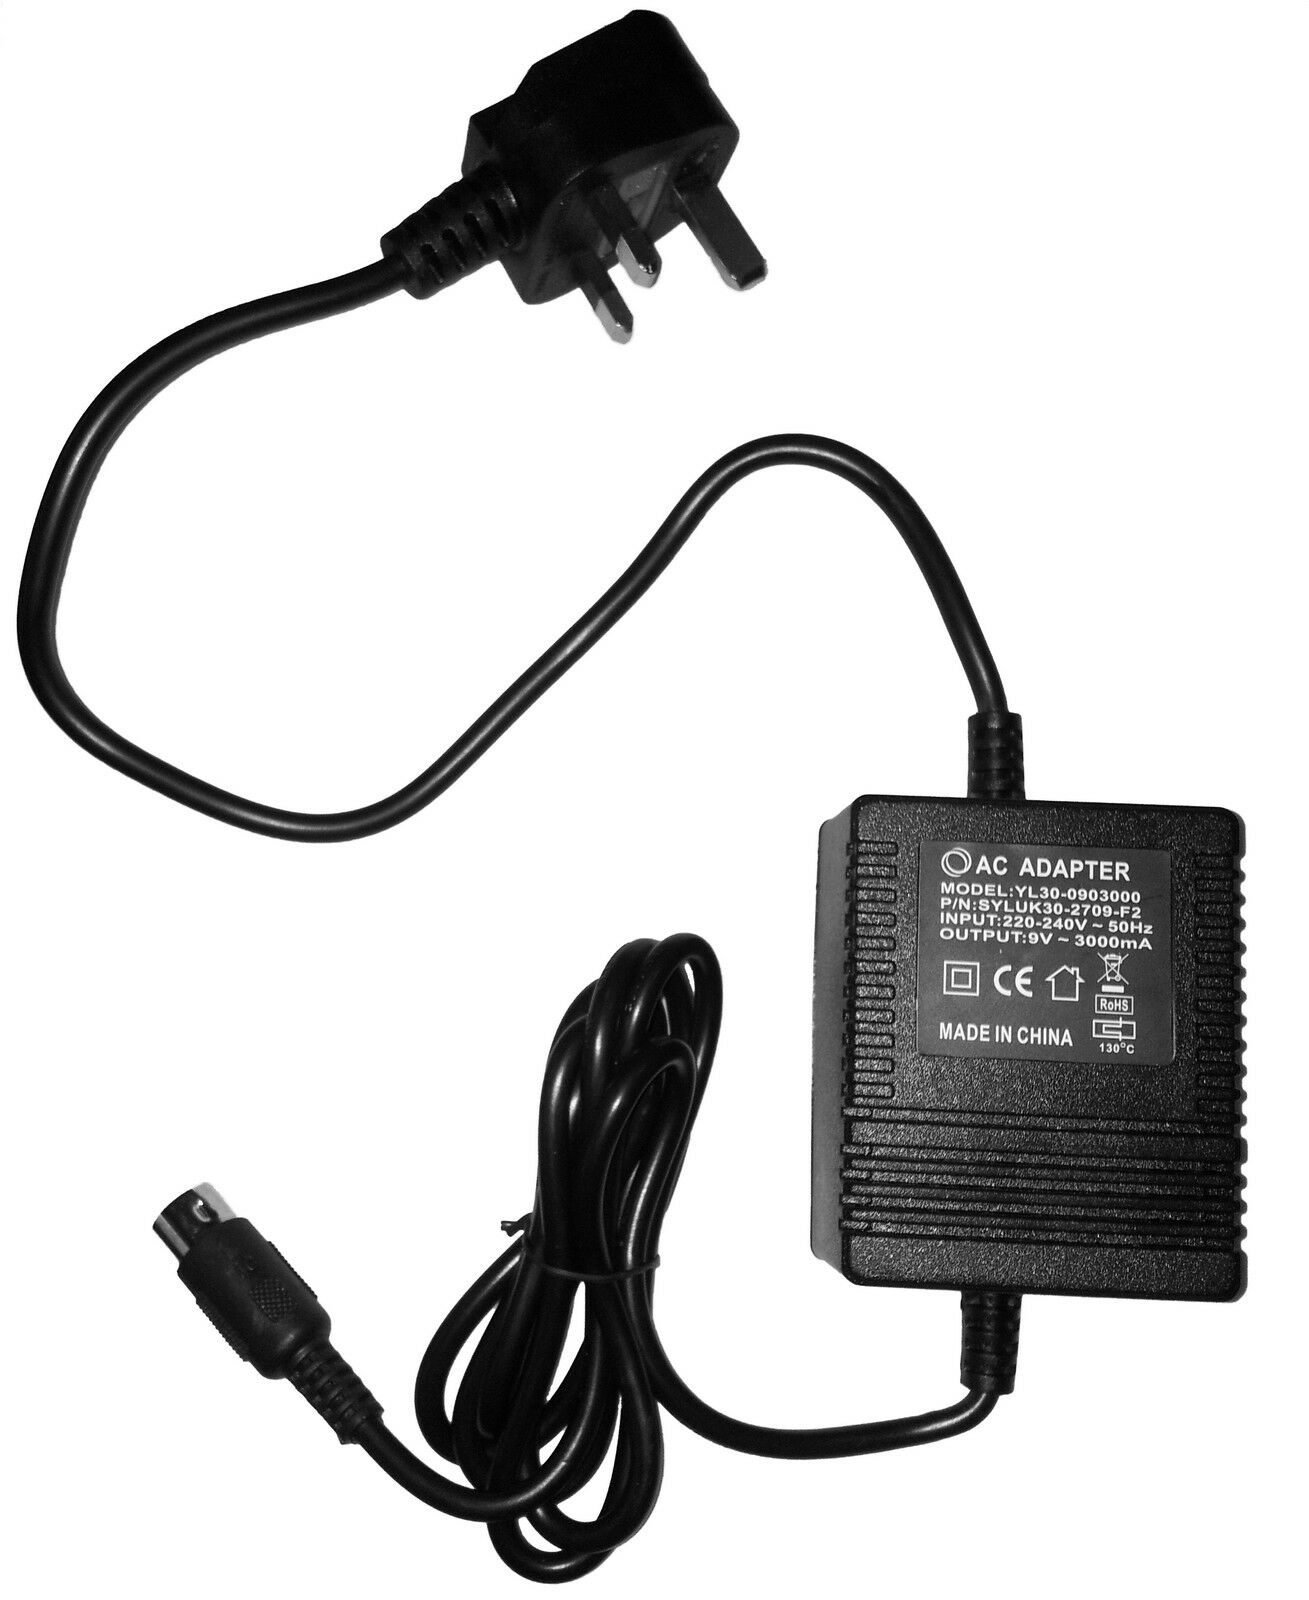 ROCKTRON UTOPIA G100 POWER SUPPLY REPLACEMENT ADAPTER UK 9V 220V 230V 240V